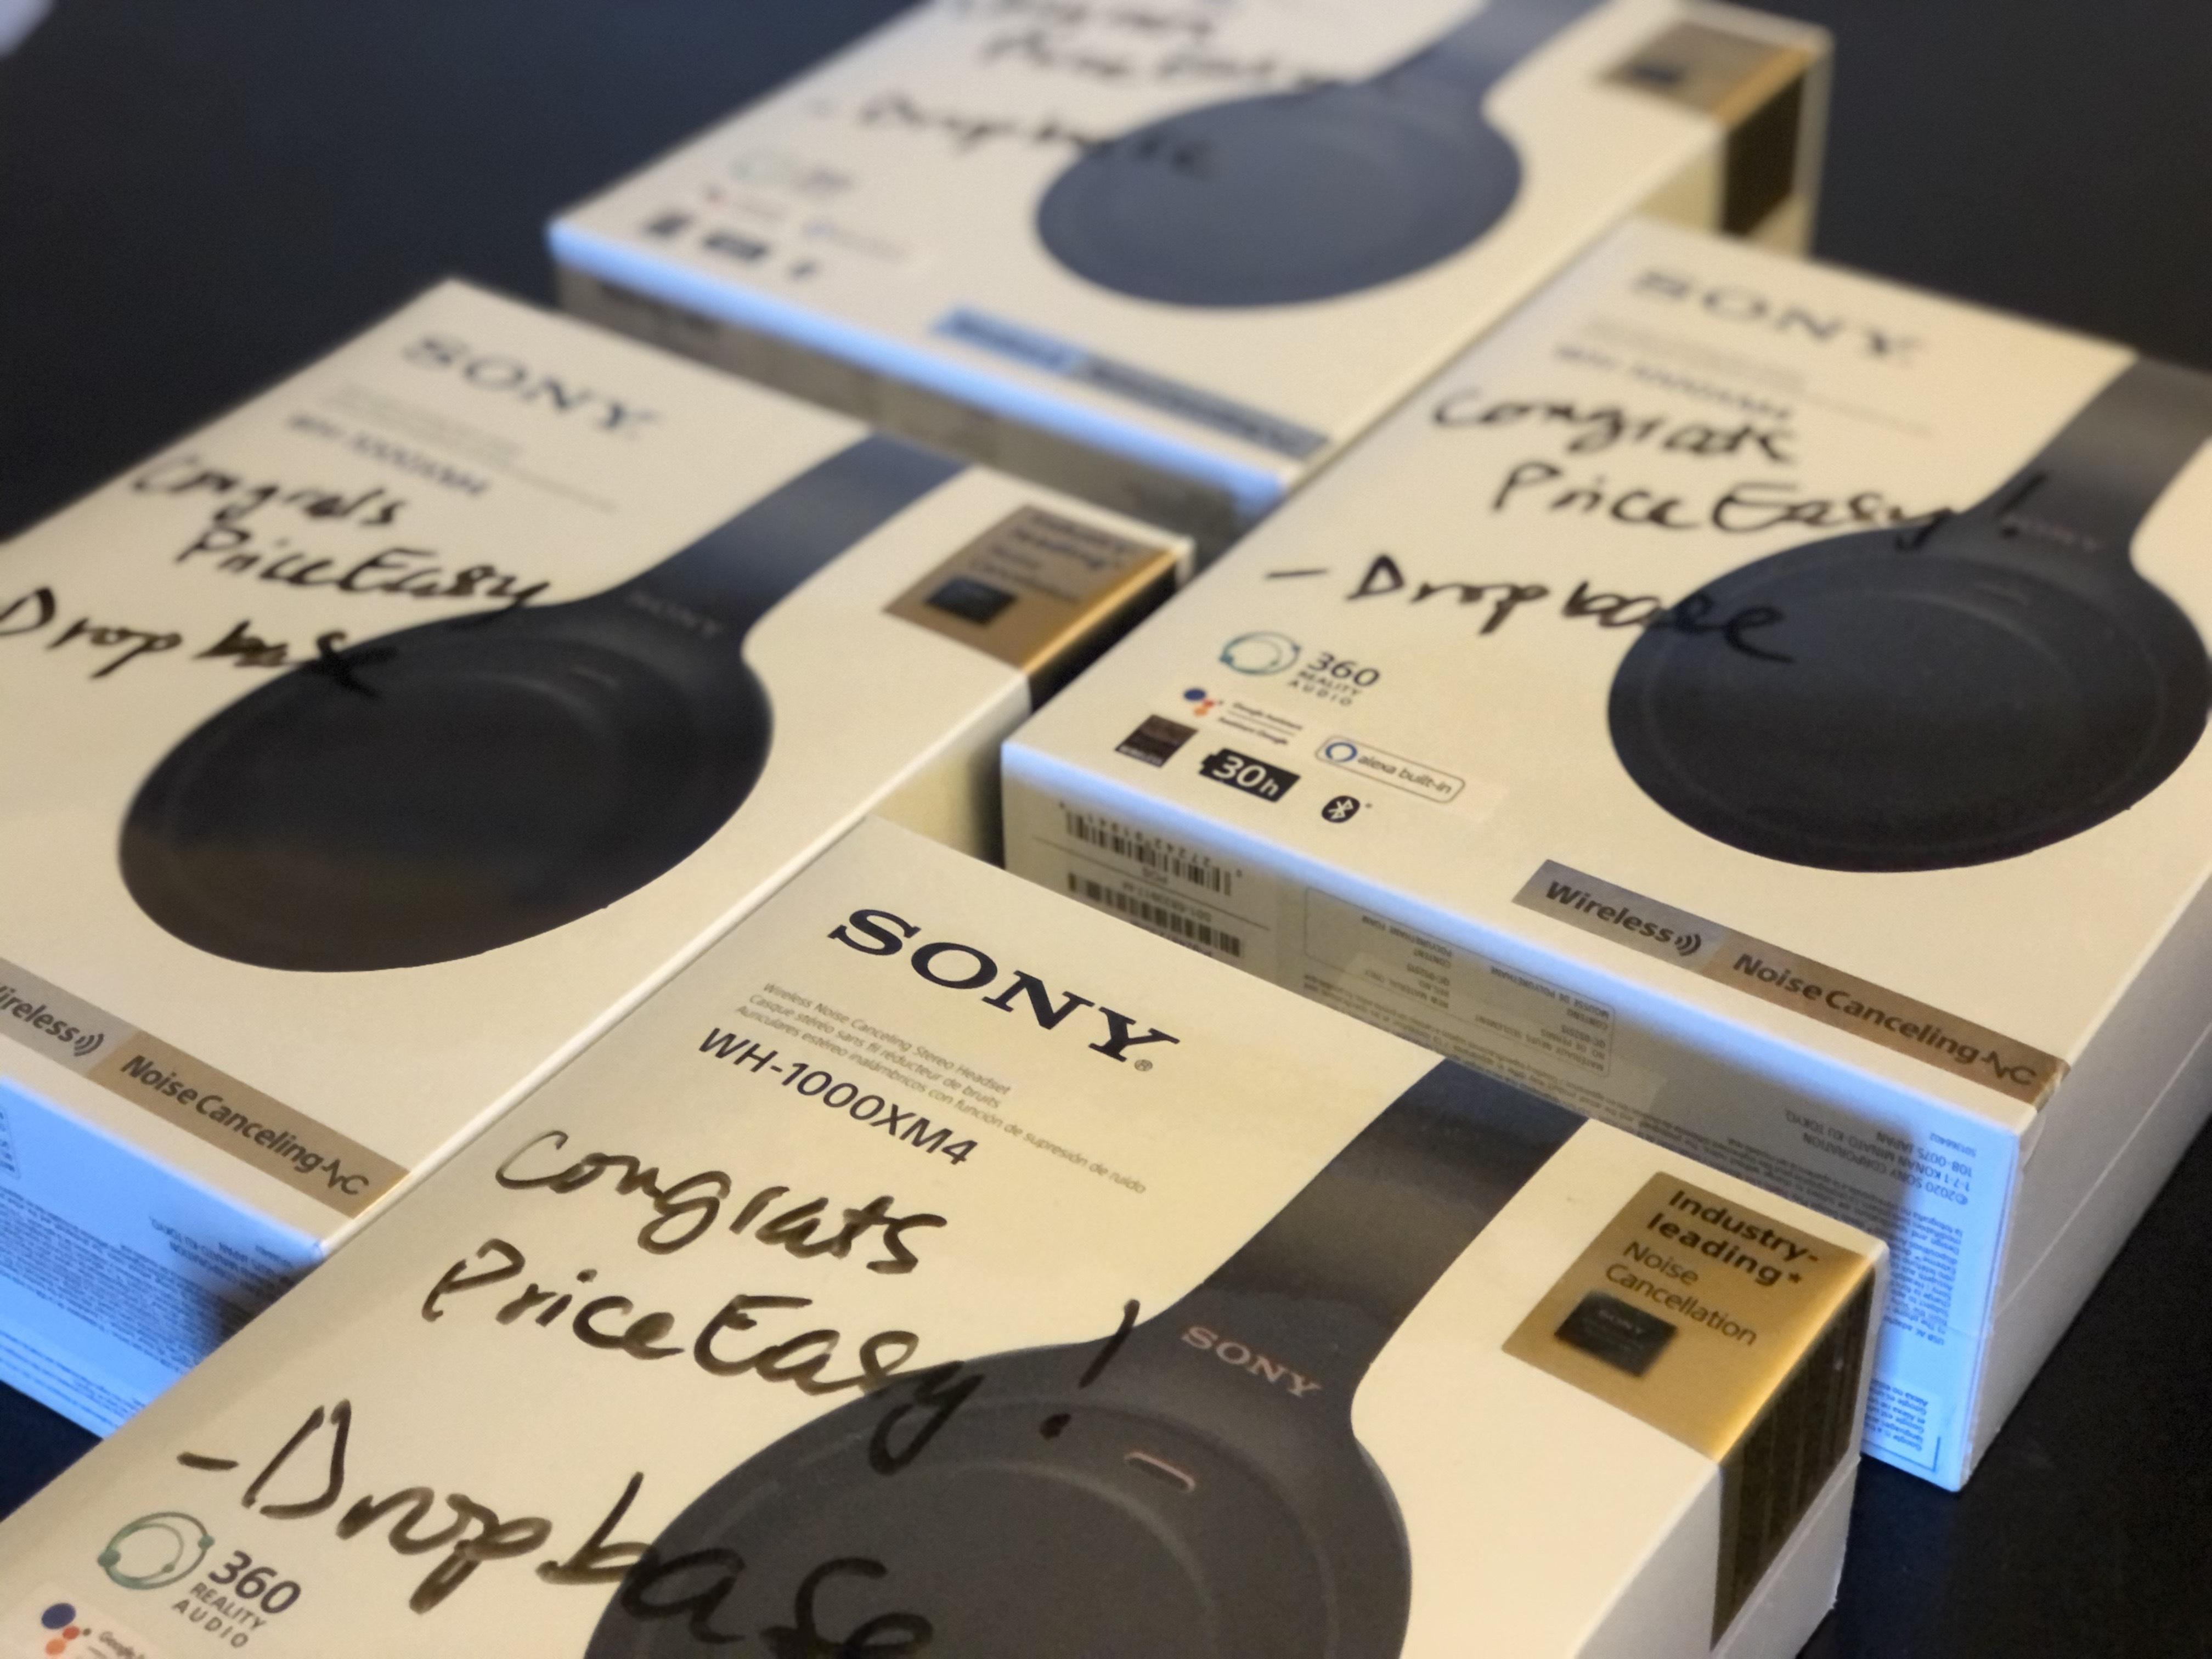 Sony XM4 Headphones for the winning team, PriceEasy